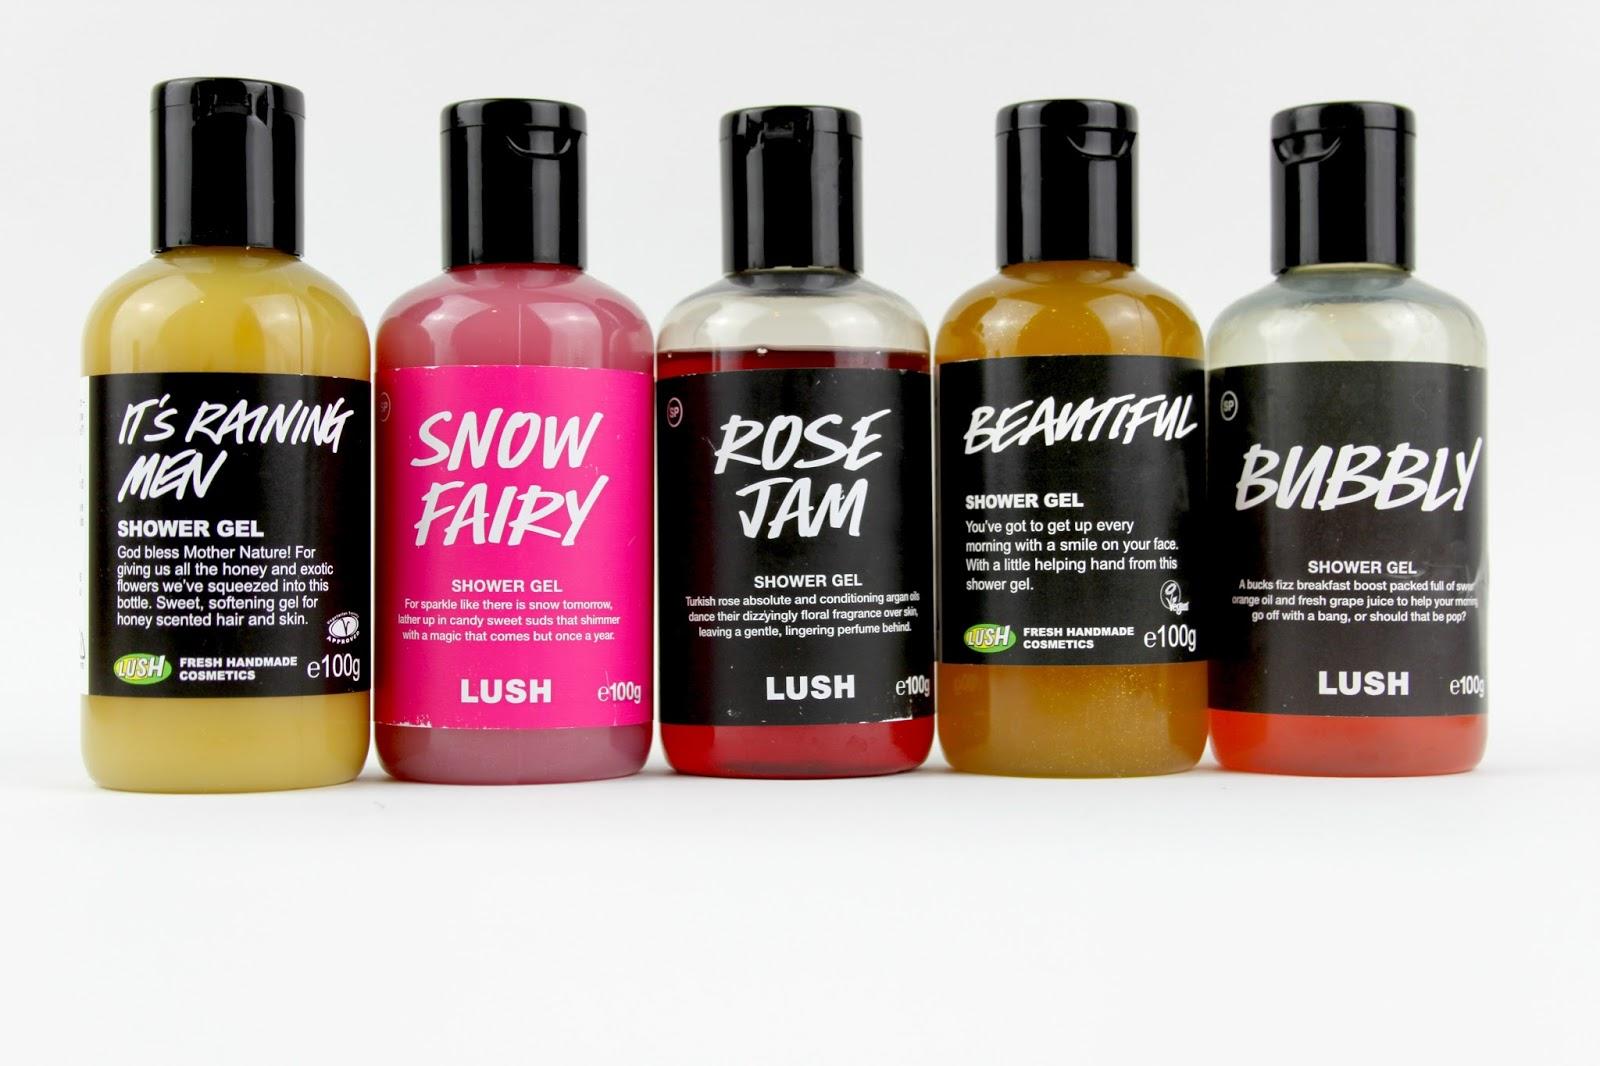 Sweet Allure It's A Shower Thing. lush lifestyle shower gel batj bomb snow fairy beautiful bubbly rose jam it's raining men